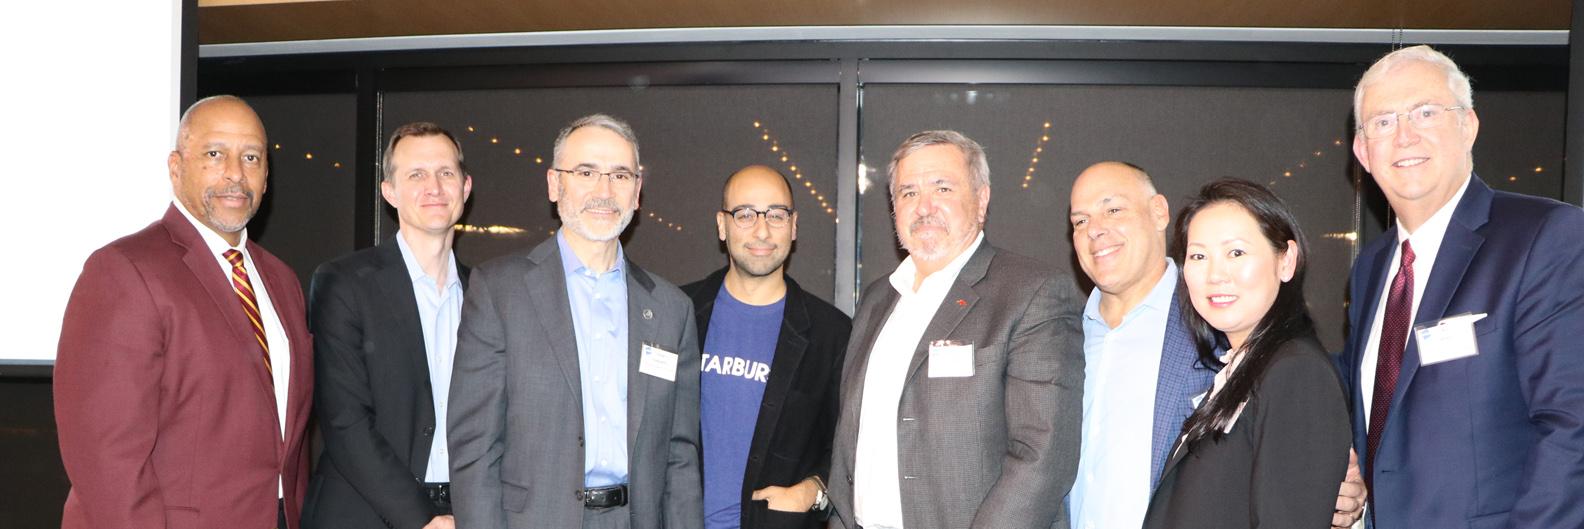 Speakers at LAEDC Future Forum, L to R: Thomas A. Parham, George Whitesides, Steve Isakowitz, Van Espahbodi, Mark Davidson, Paul Russell, Linda Huber, Bill Allen